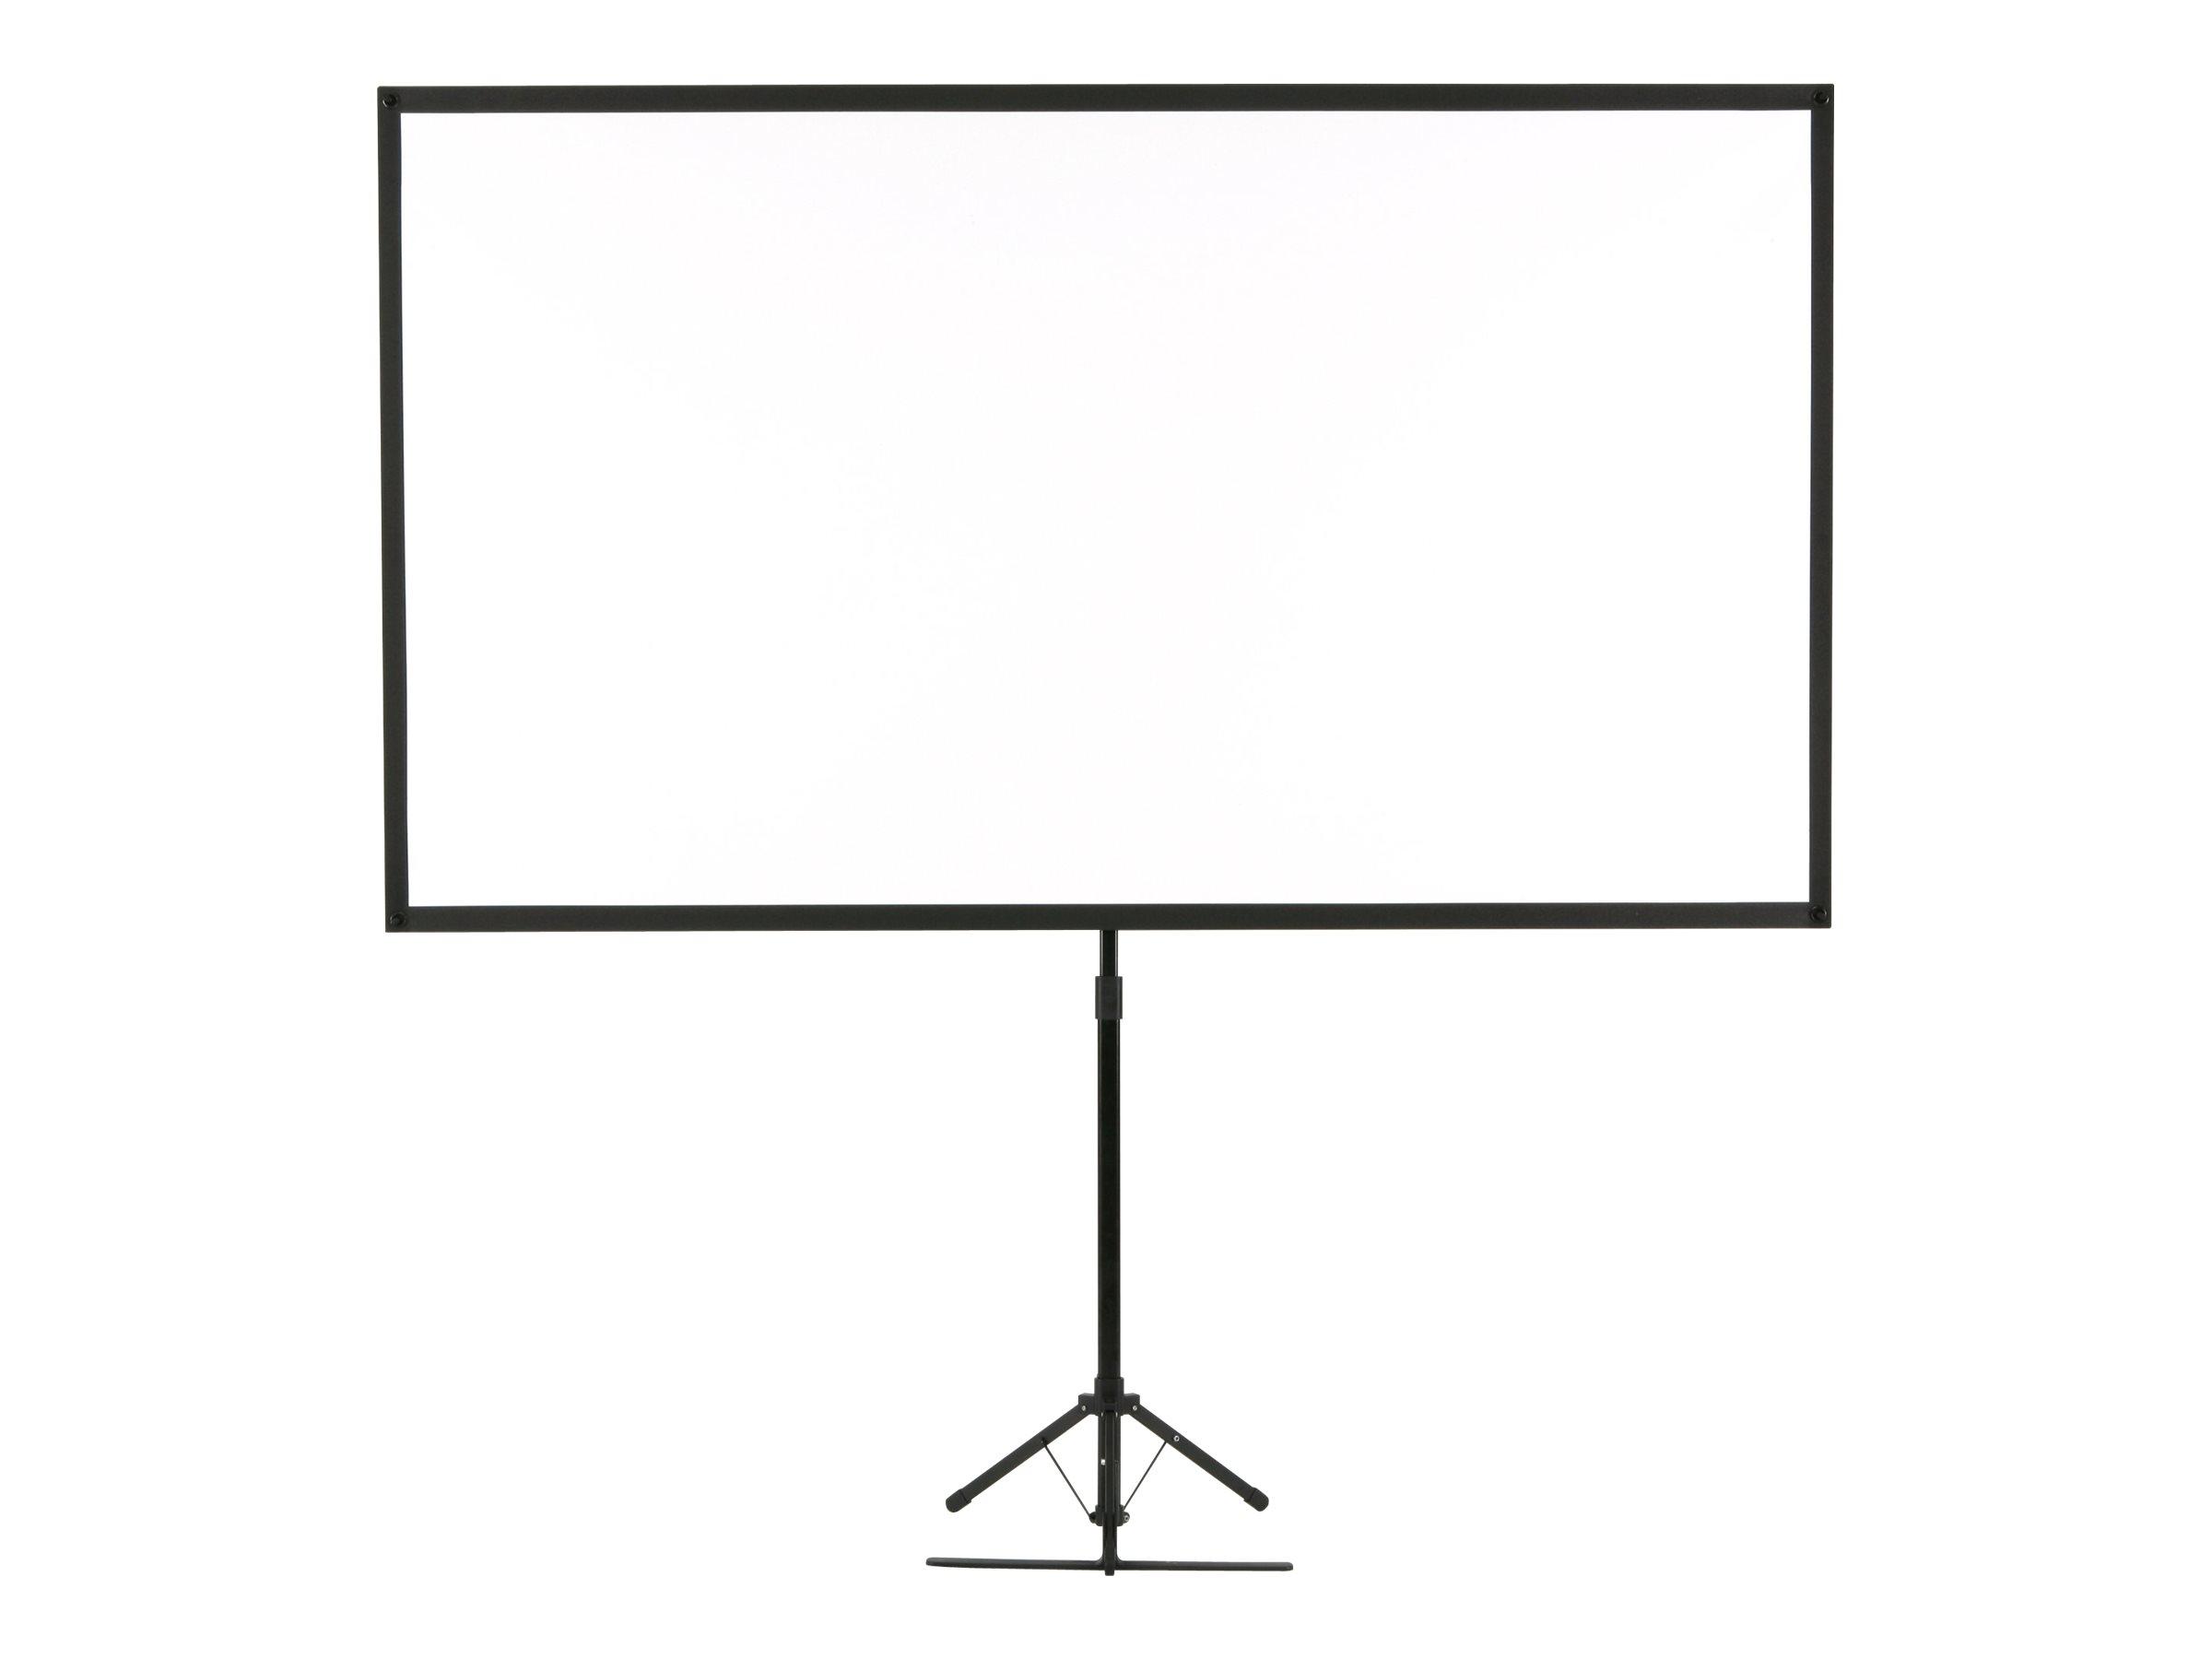 Epson ELPSC21 - Projektionsbildschirm mit Stativ - 203 cm (80